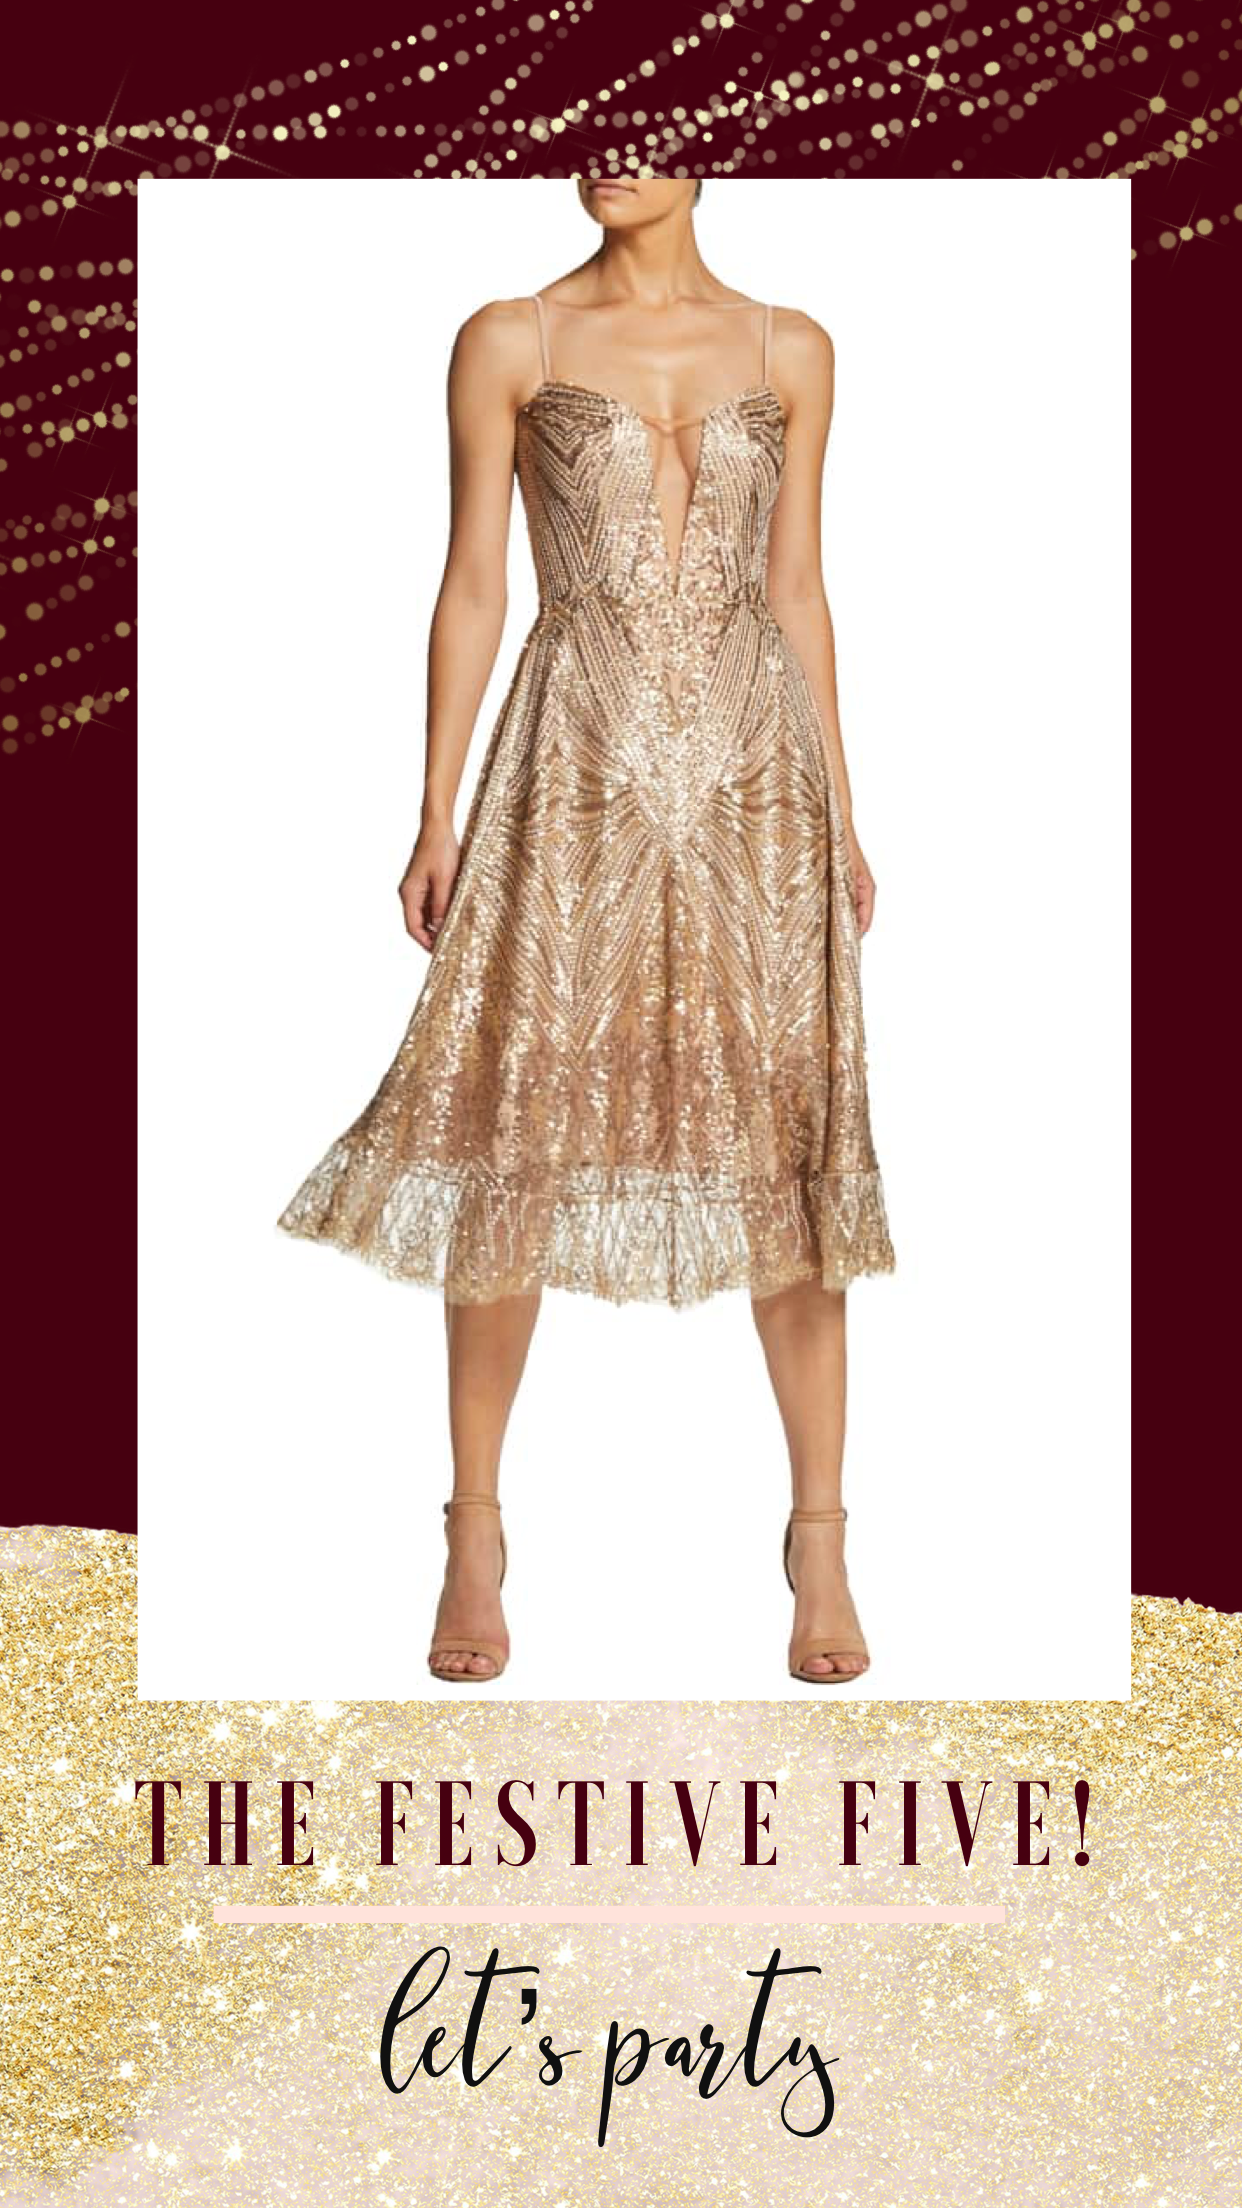 sequin gown, wedding guest dress, party dress, holiday dress, nye dress, Christmas dress